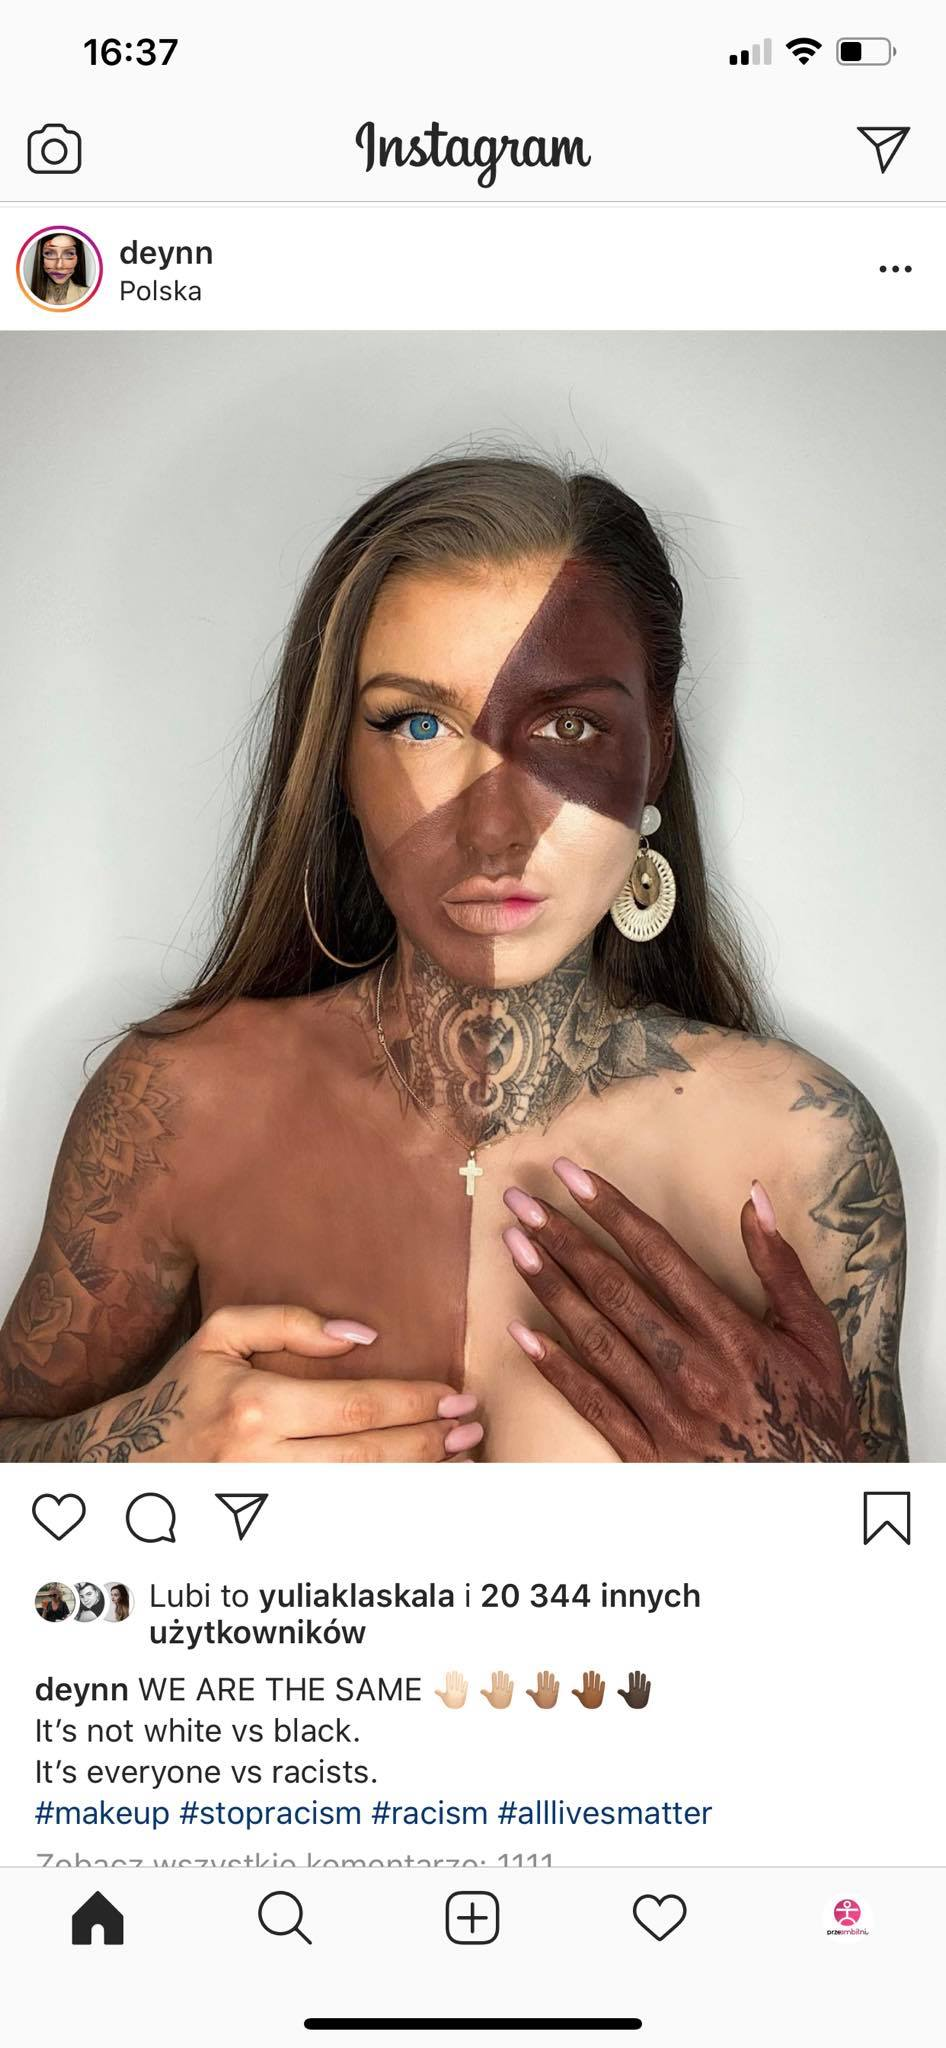 rasizmowi